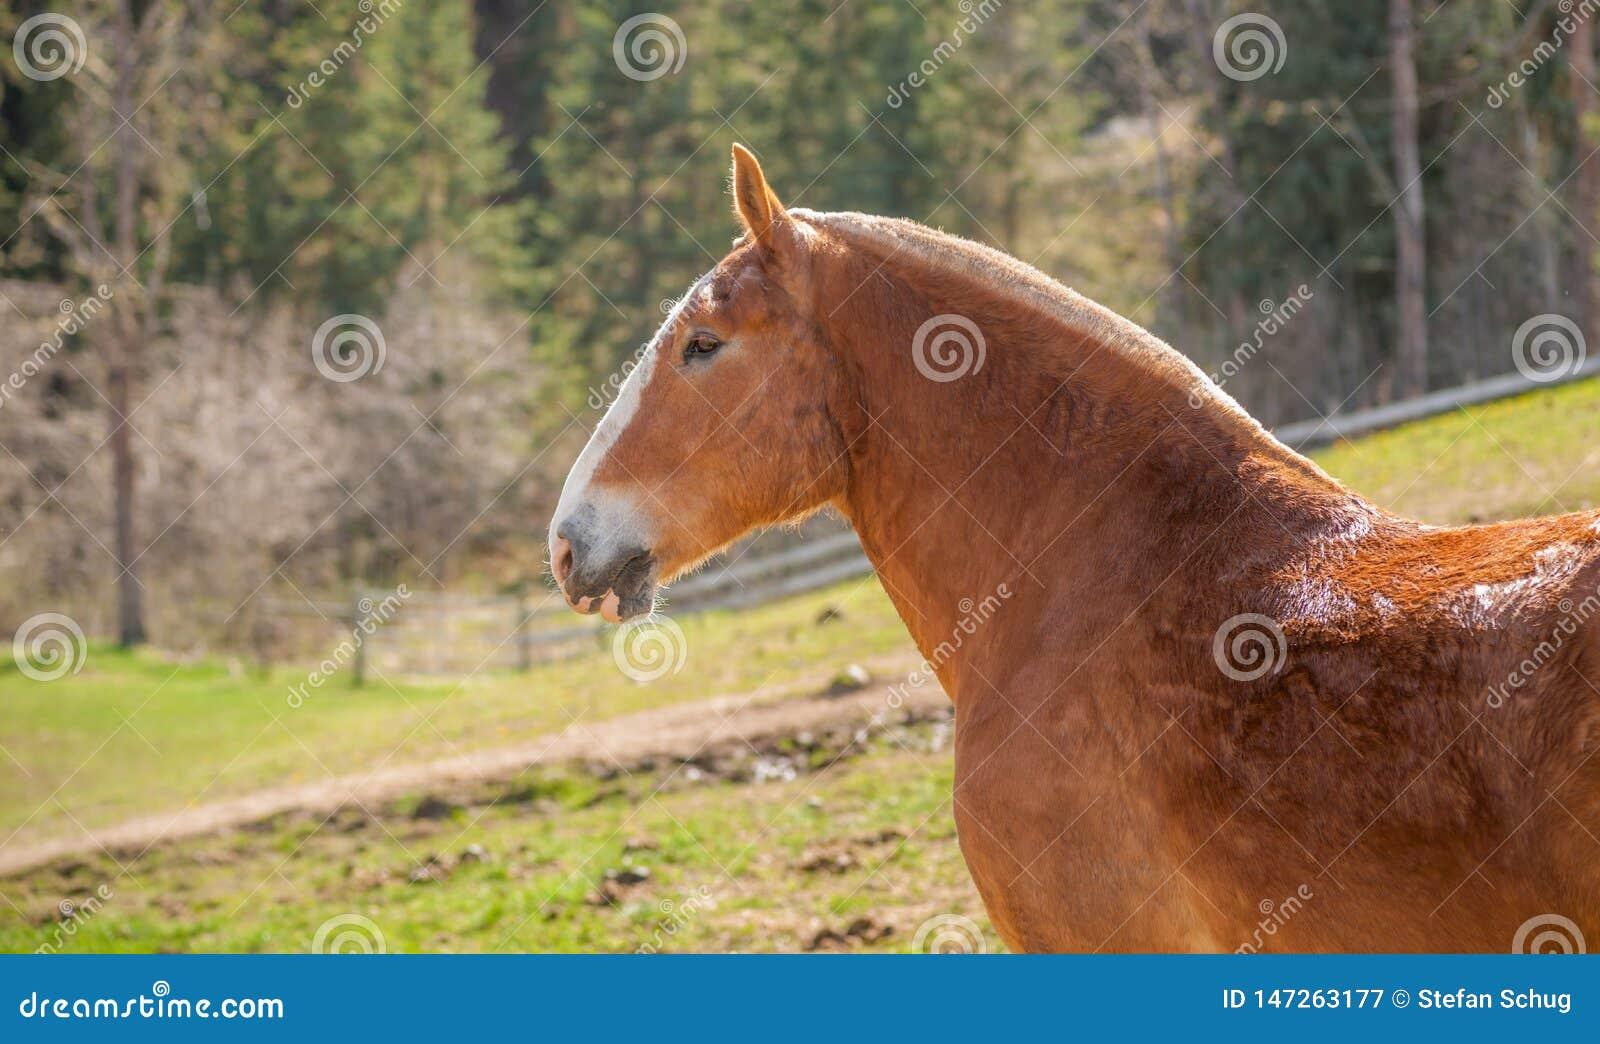 Draft Horse Profile Portrait Of Head And Neck Stock Image Image Of Alert Portrait 147263177